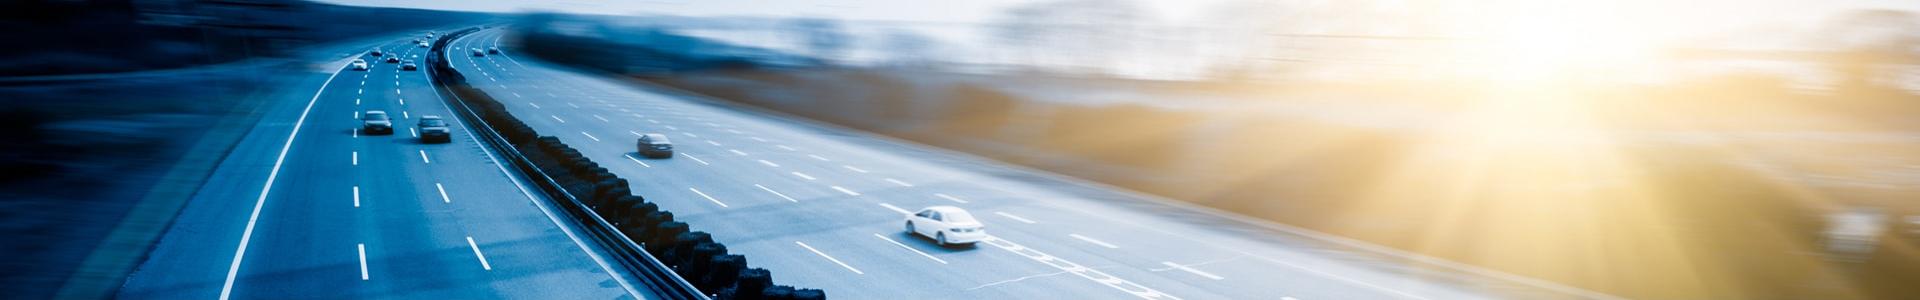 Stiri si noutati EVO GPS - Articole blog | evogps.ro